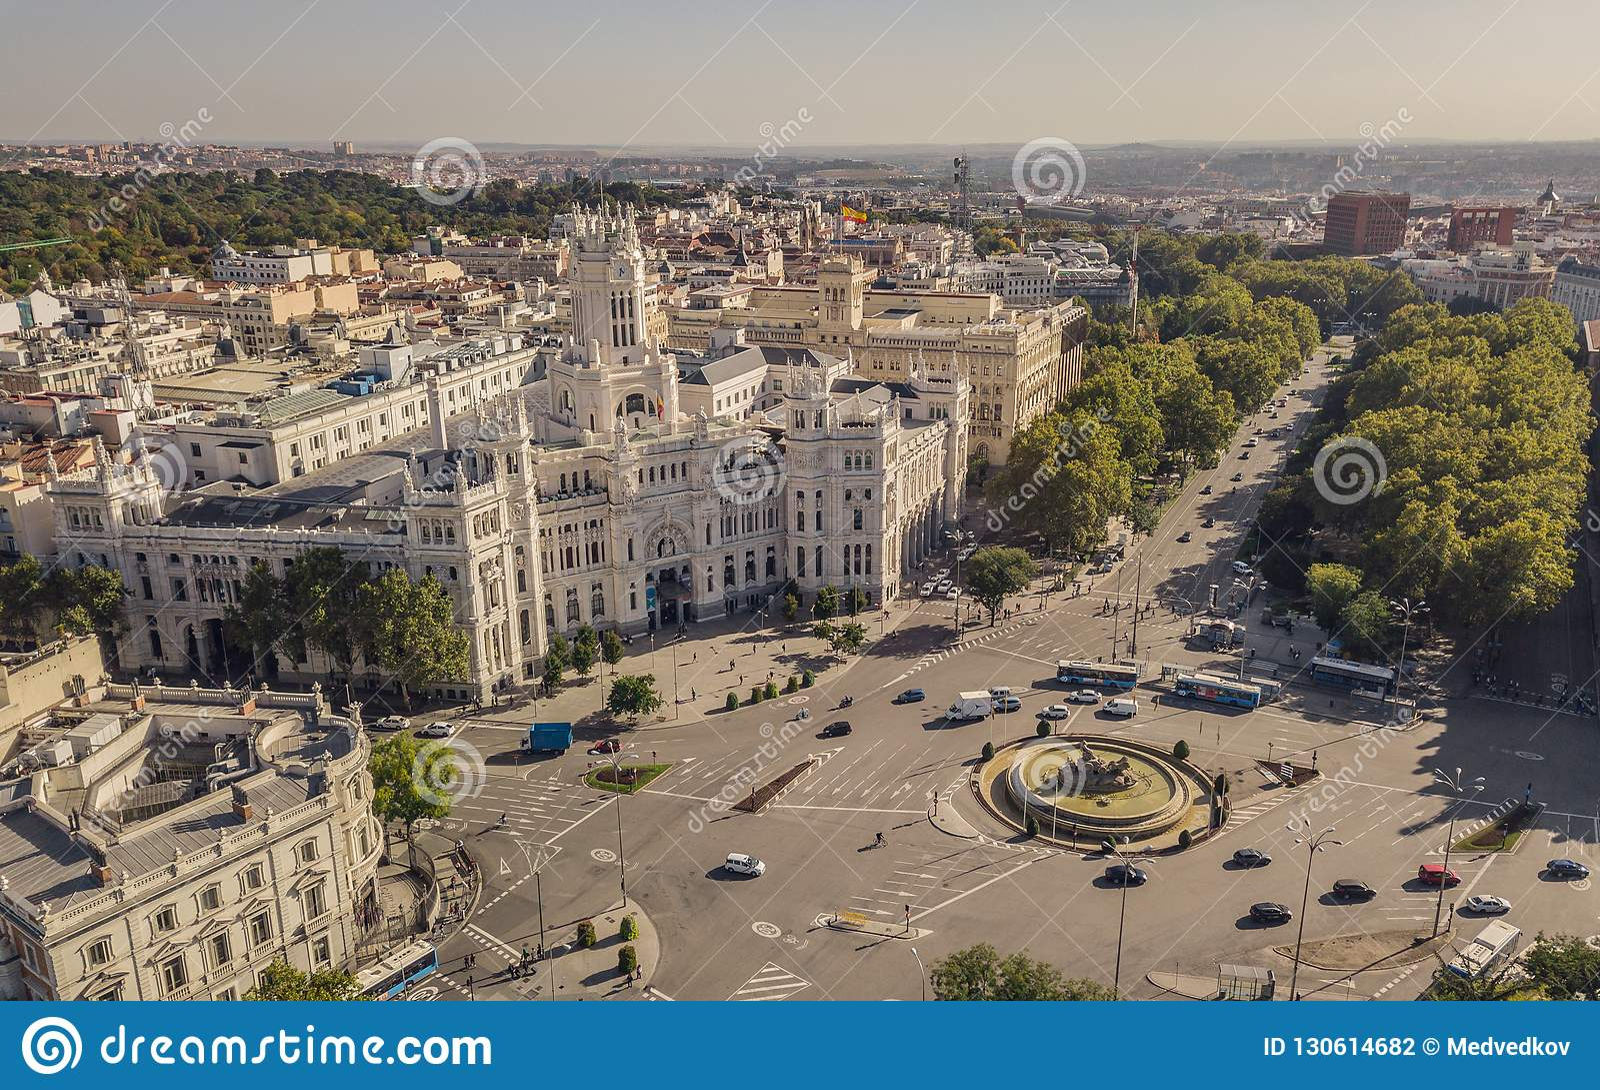 City Hall Of Madrid And Plaza De Cibeles Stock Photo Image